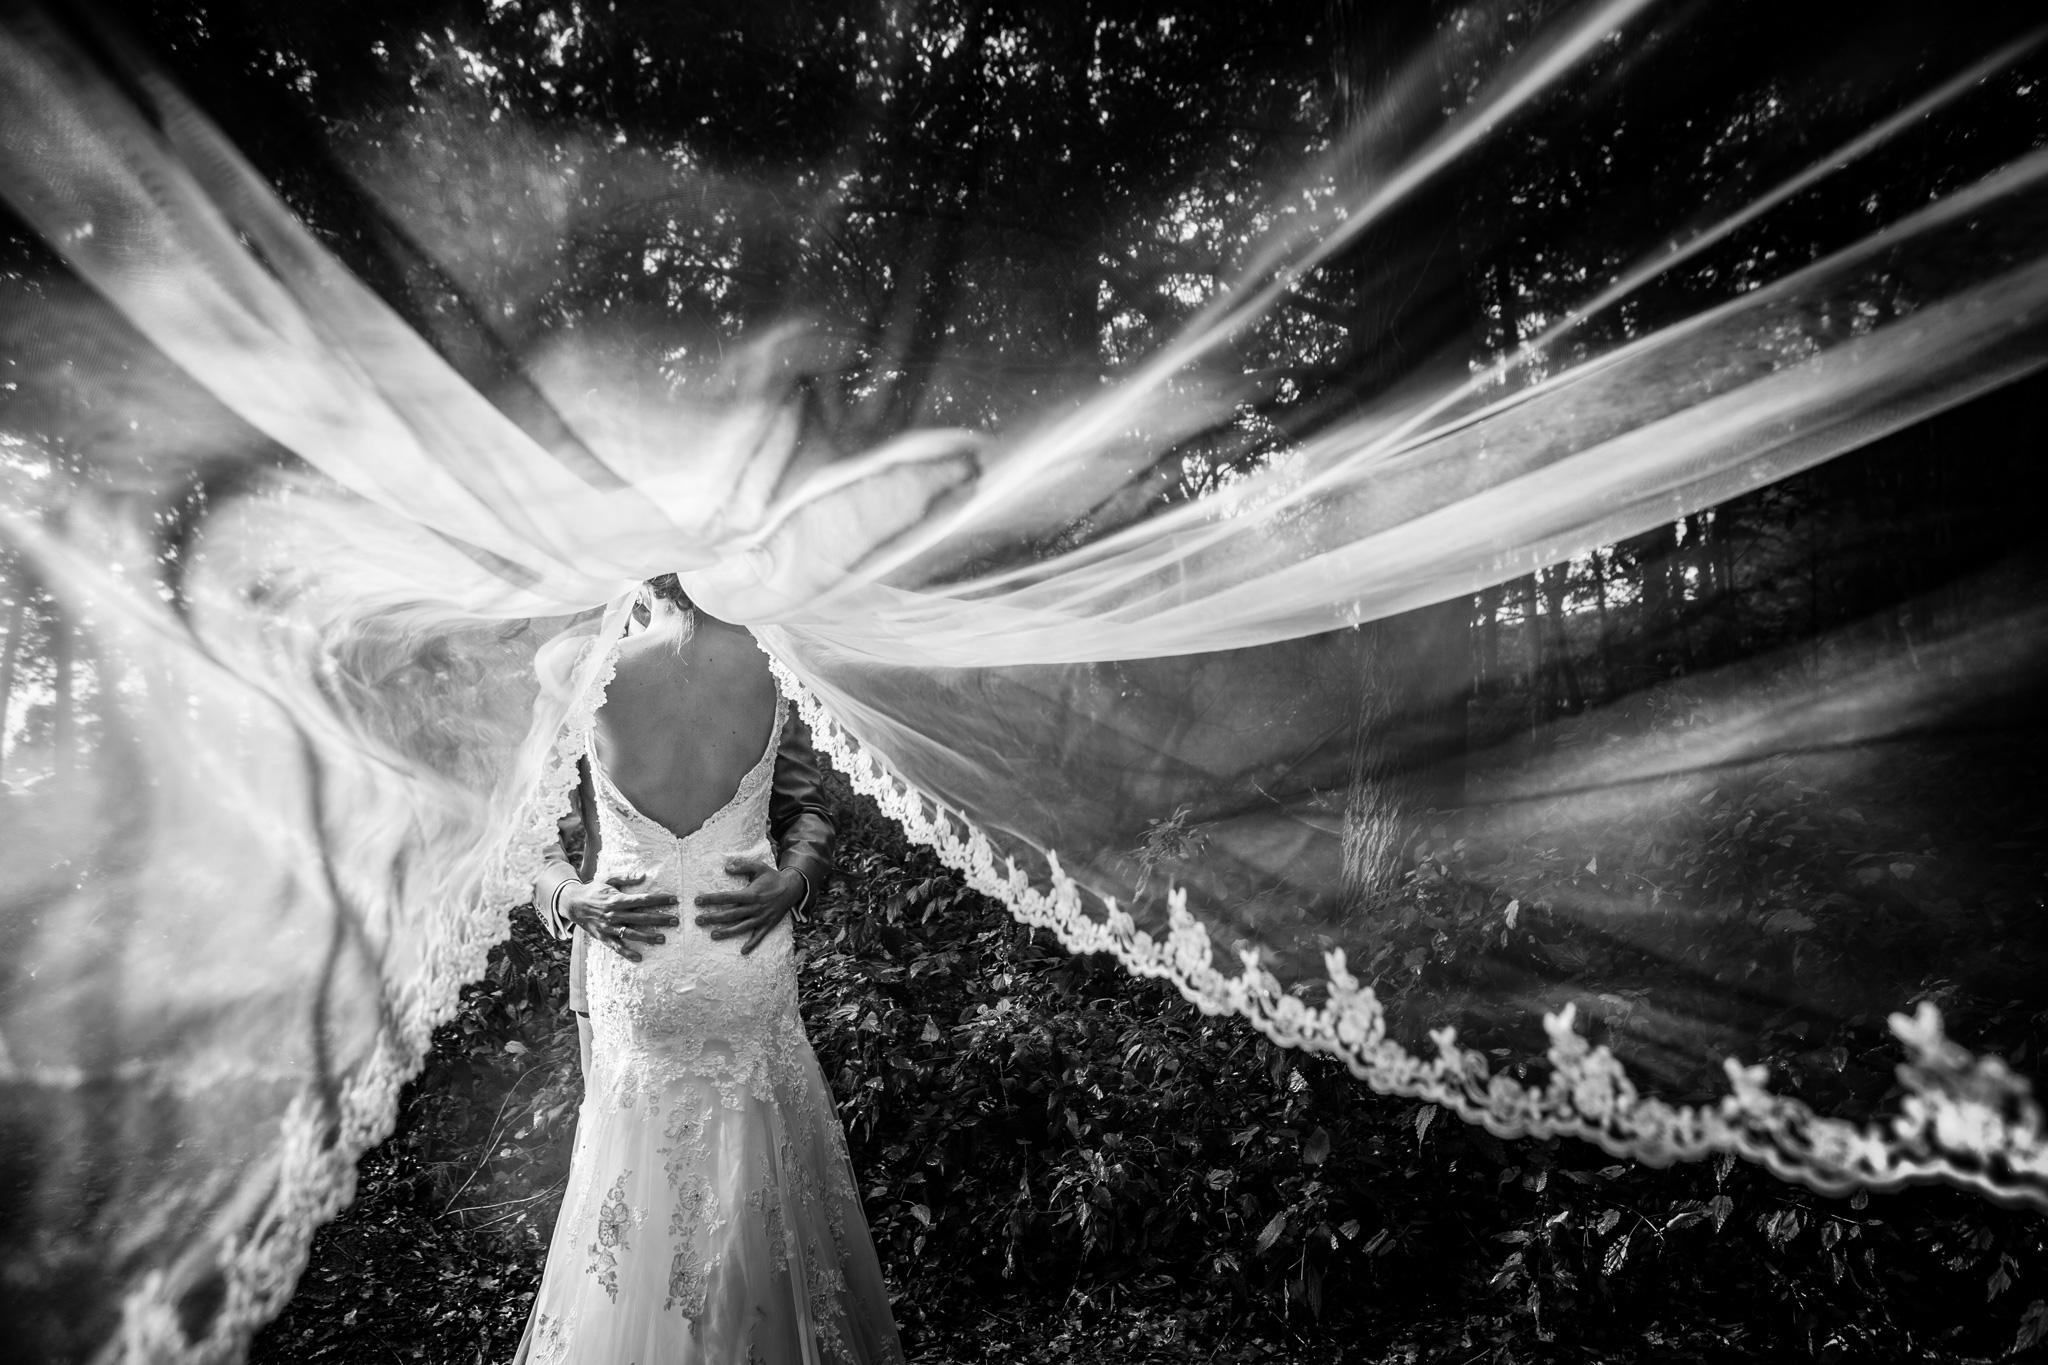 Bruidsreportage-Loonse-en-Drunense-Duinen